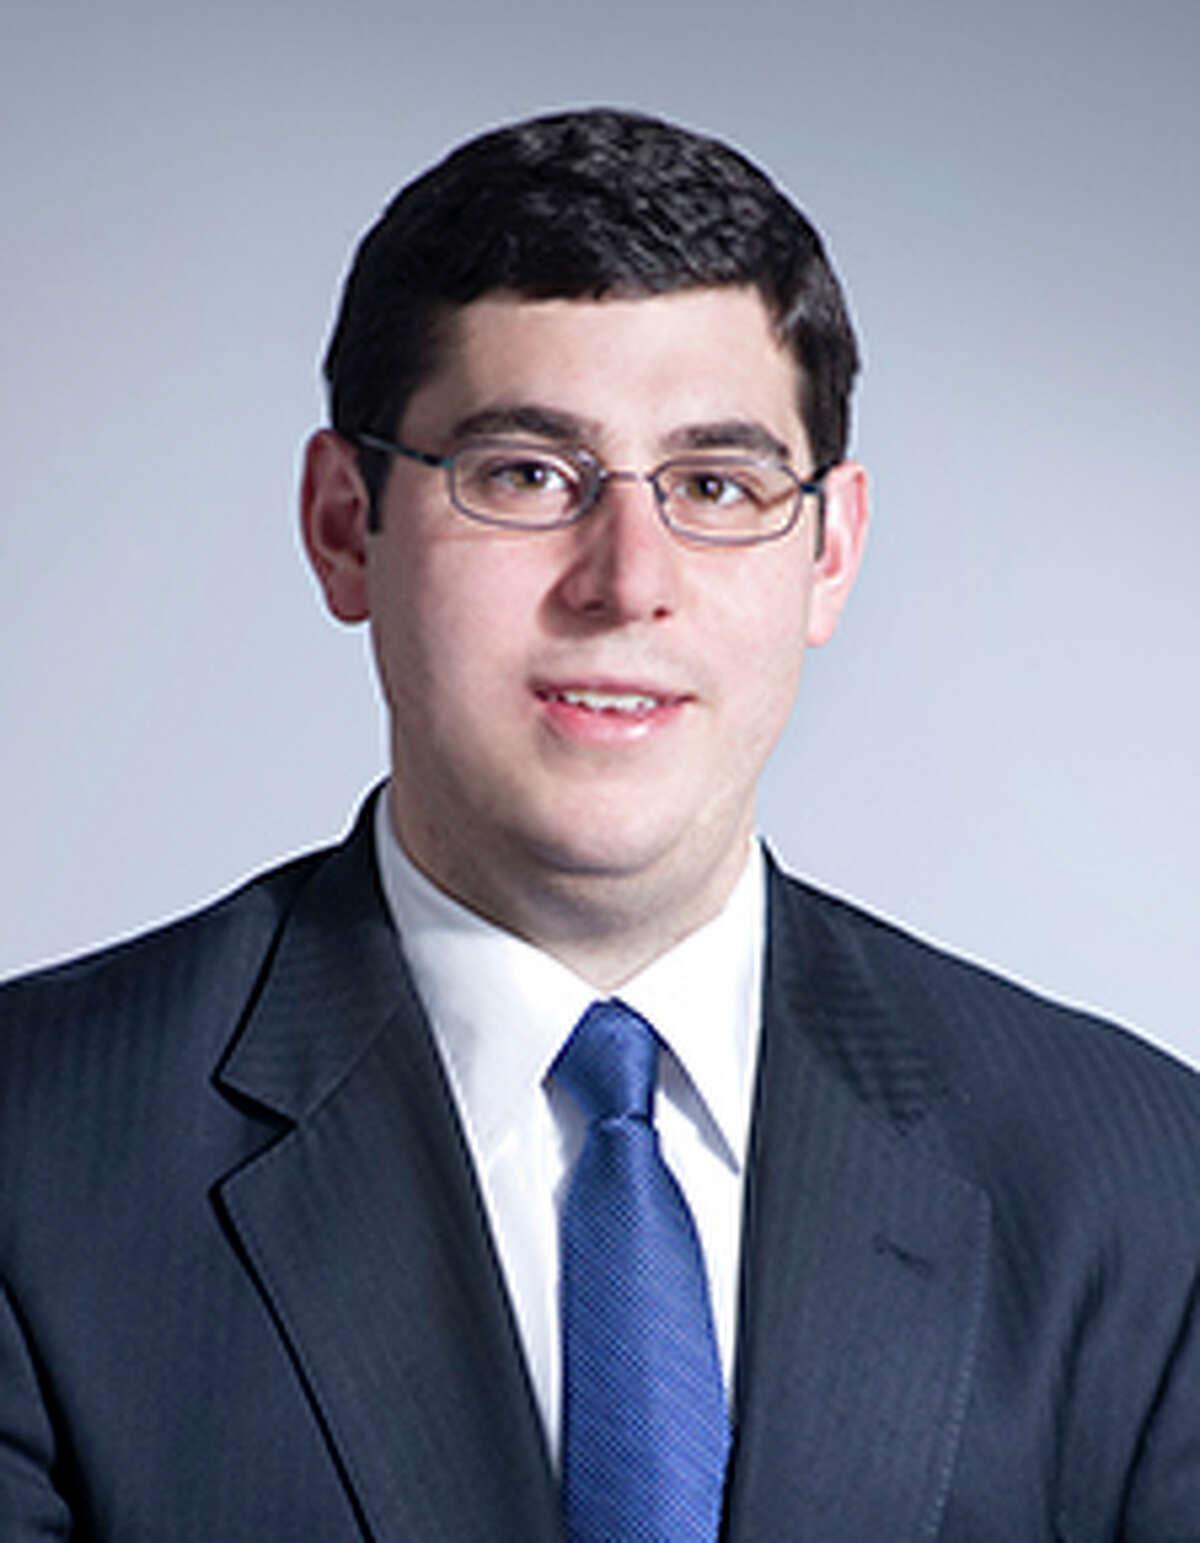 David Becker, Representative Town Meeting member and potential first selectman candidate